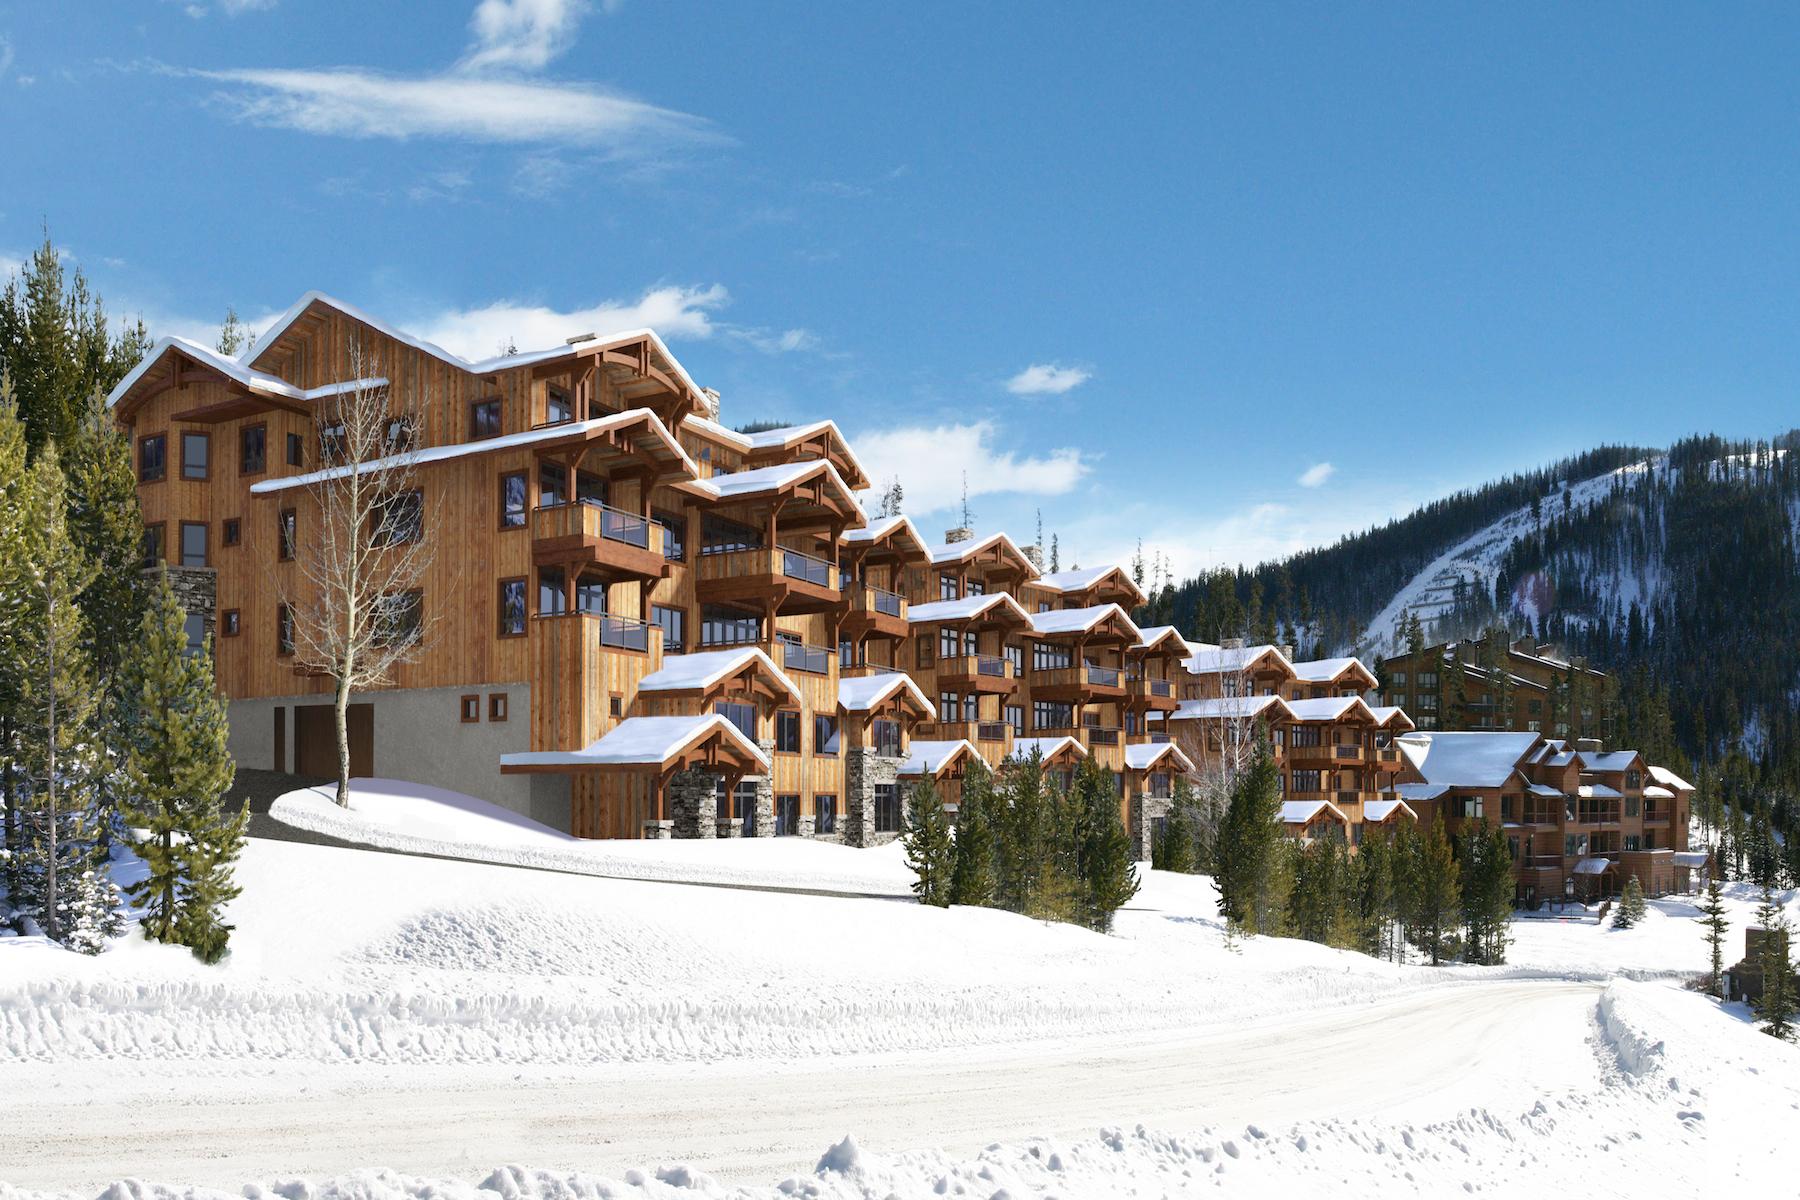 Condominium for Sale at New Construction Mountain Lake Condo 2 Summit View Road Unit 502 Big Sky, Montana 59716 United States